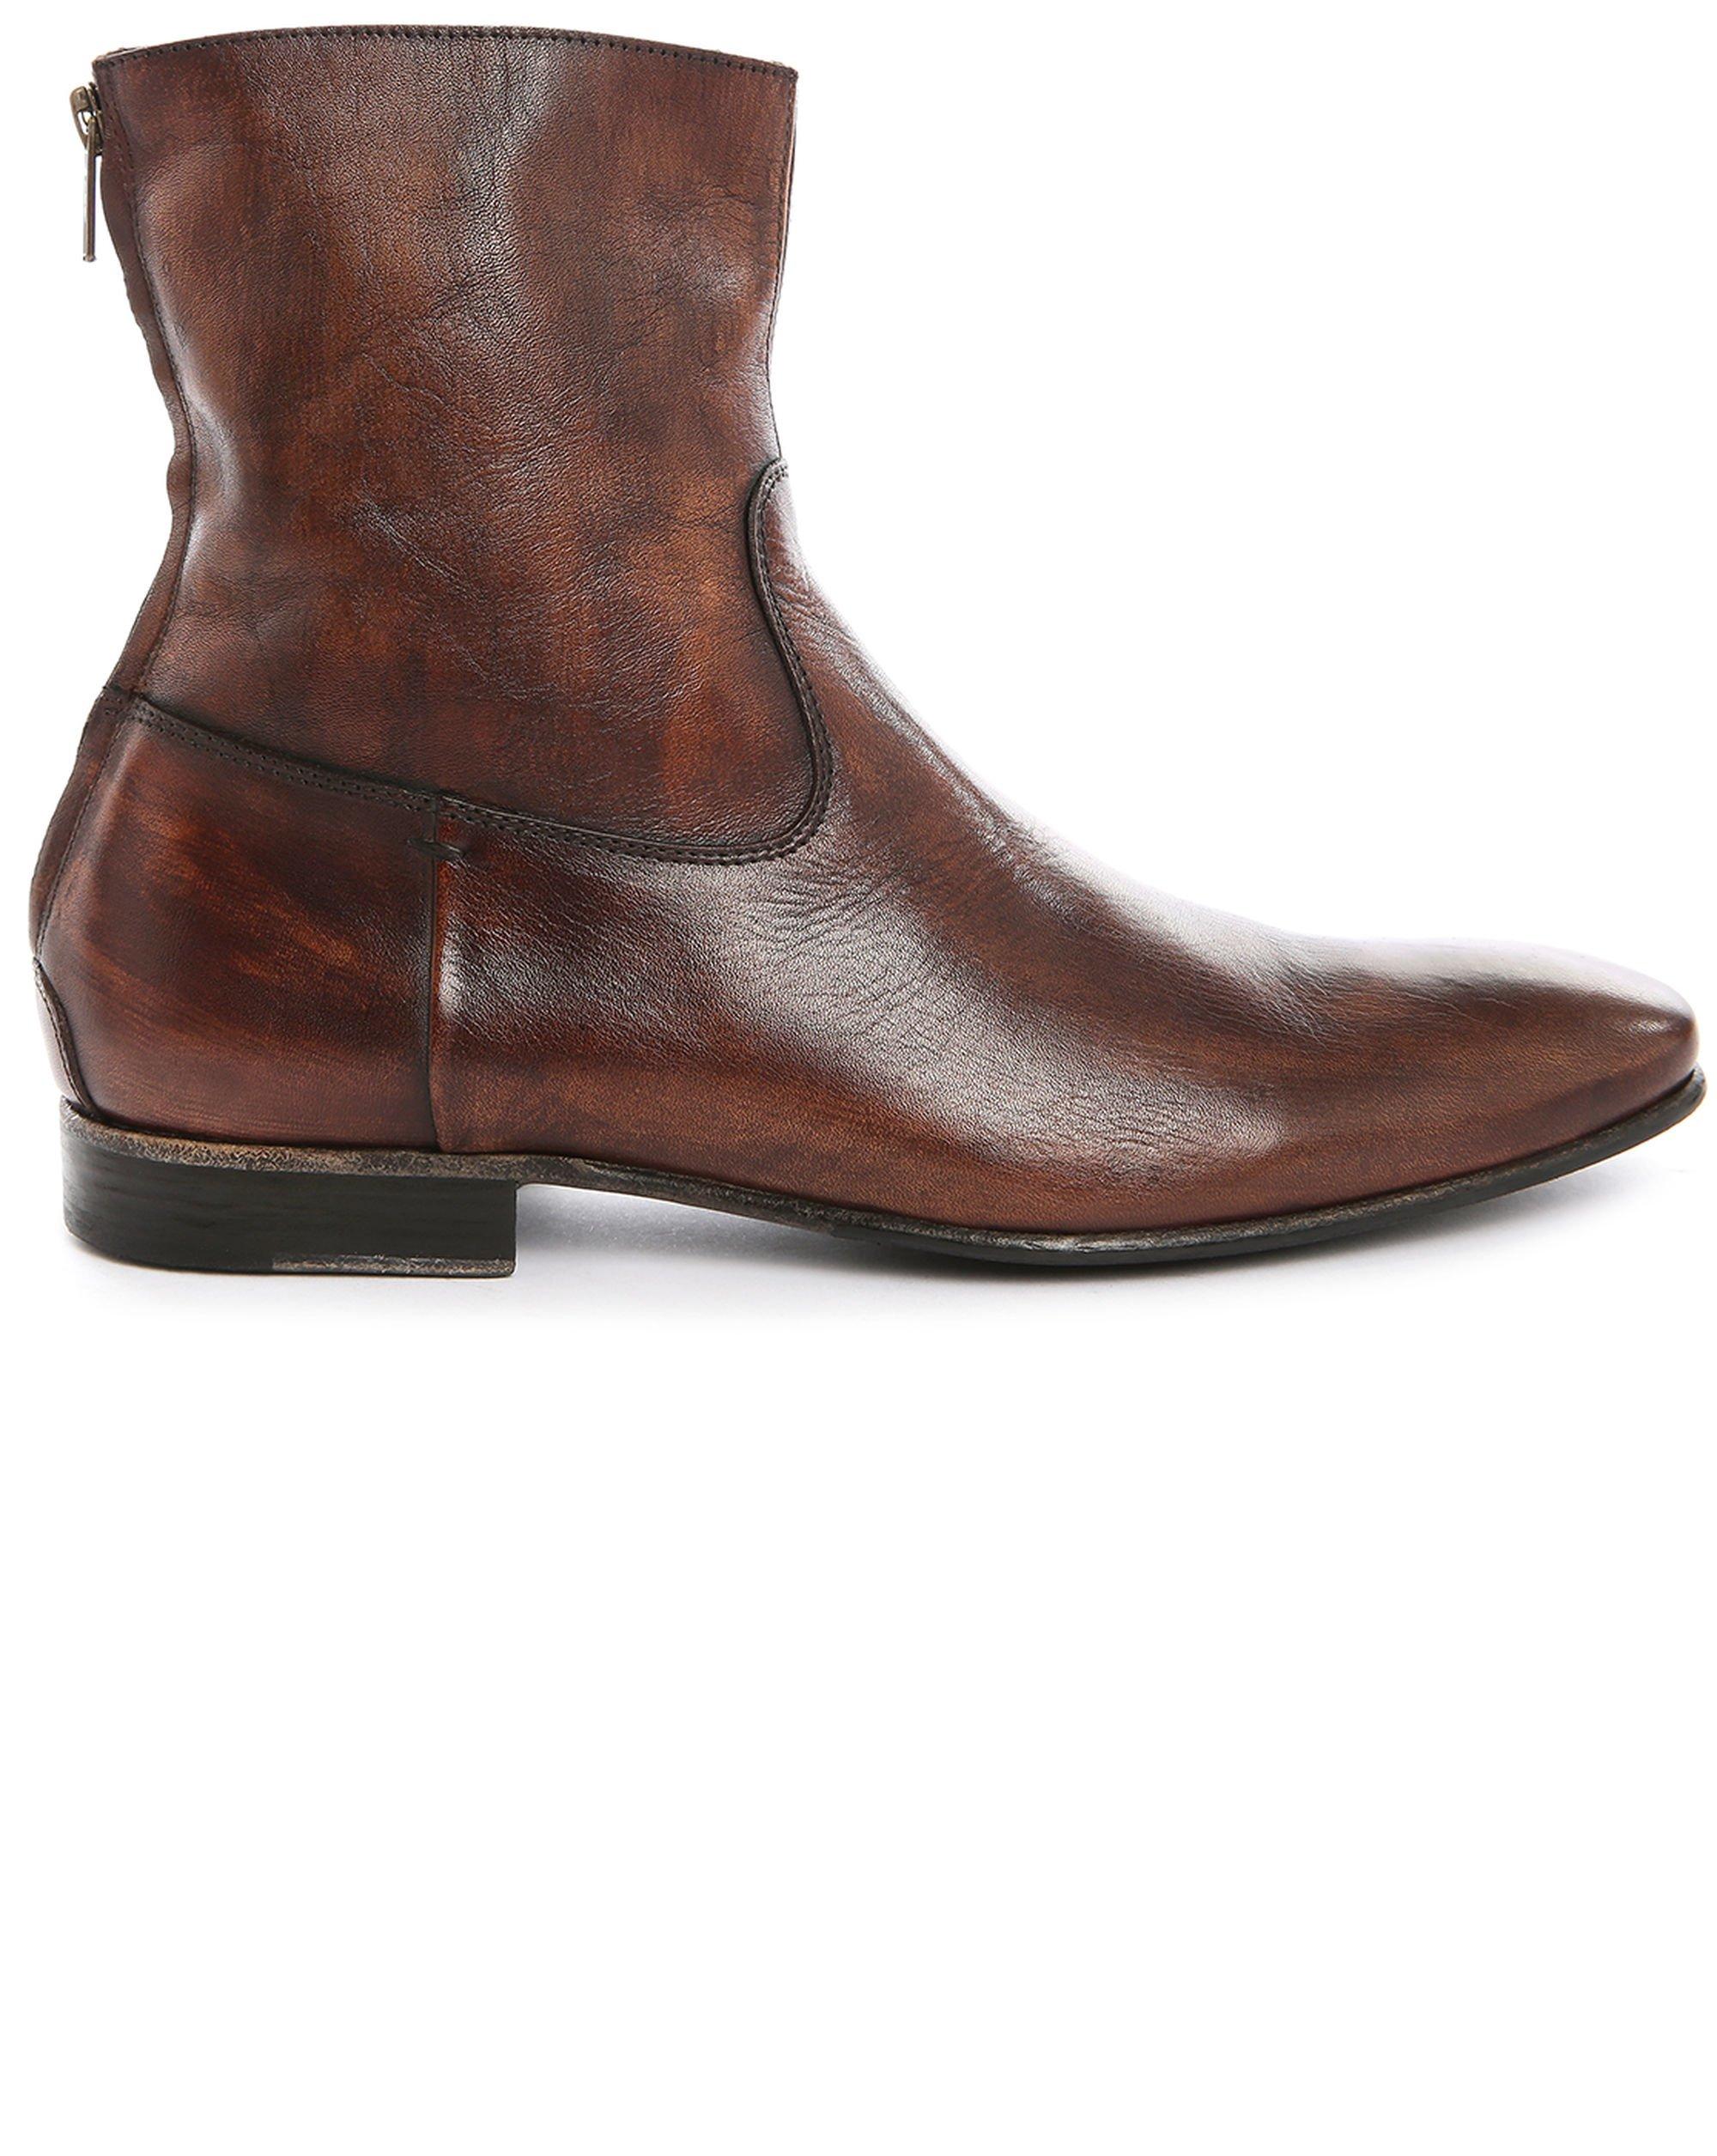 Shania Mid Calf Black Patent Leather Boot. $ Shania Mid Calf Dark Brown Nappa Leather Boot. $ Shania Mid Calf Red-Brown Nappa Leather Boot. $ Shannon Riding Boots Black. $ Shannon Riding Boots Brown. $ Sheila High Heel Platform Boot .